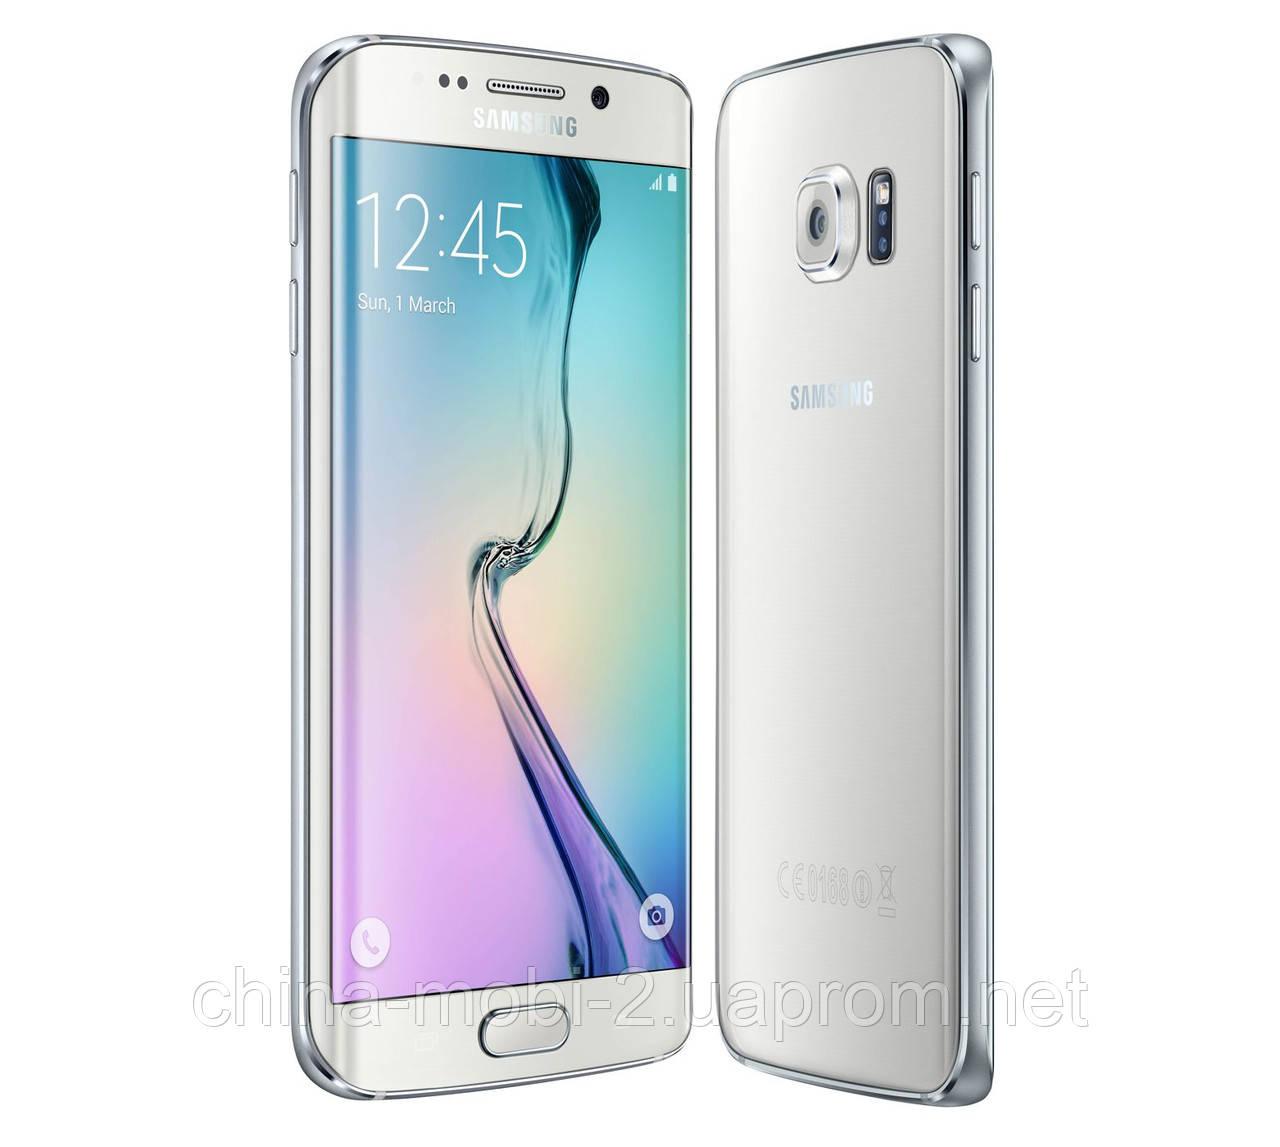 Смартфон Samsung Galaxy S6 Edge 32GB G925F White Pearl